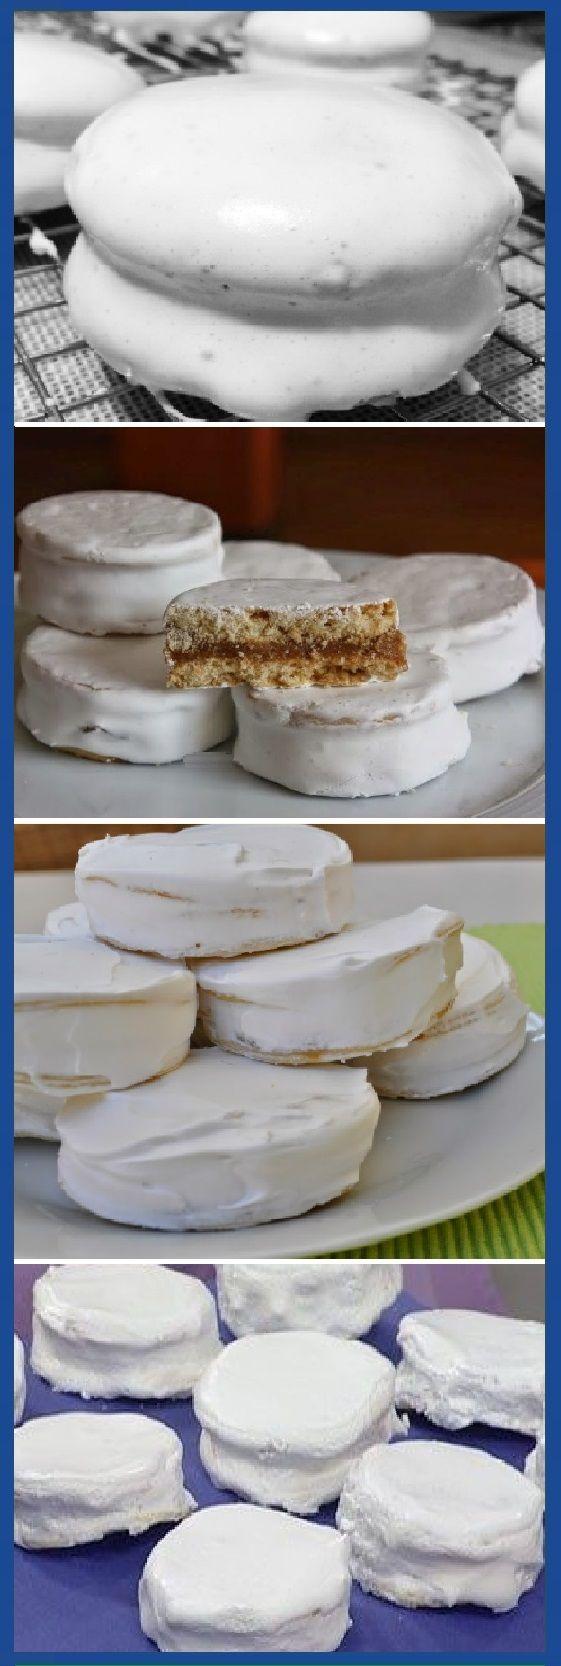 Cómo Hacer Alfajores Glaseados Mmm Alfajores Glaseados Glasa Glase Alfajor Dulces Cheesecake Postres Dulces Tips Cake Sweet Recipes Desserts Food